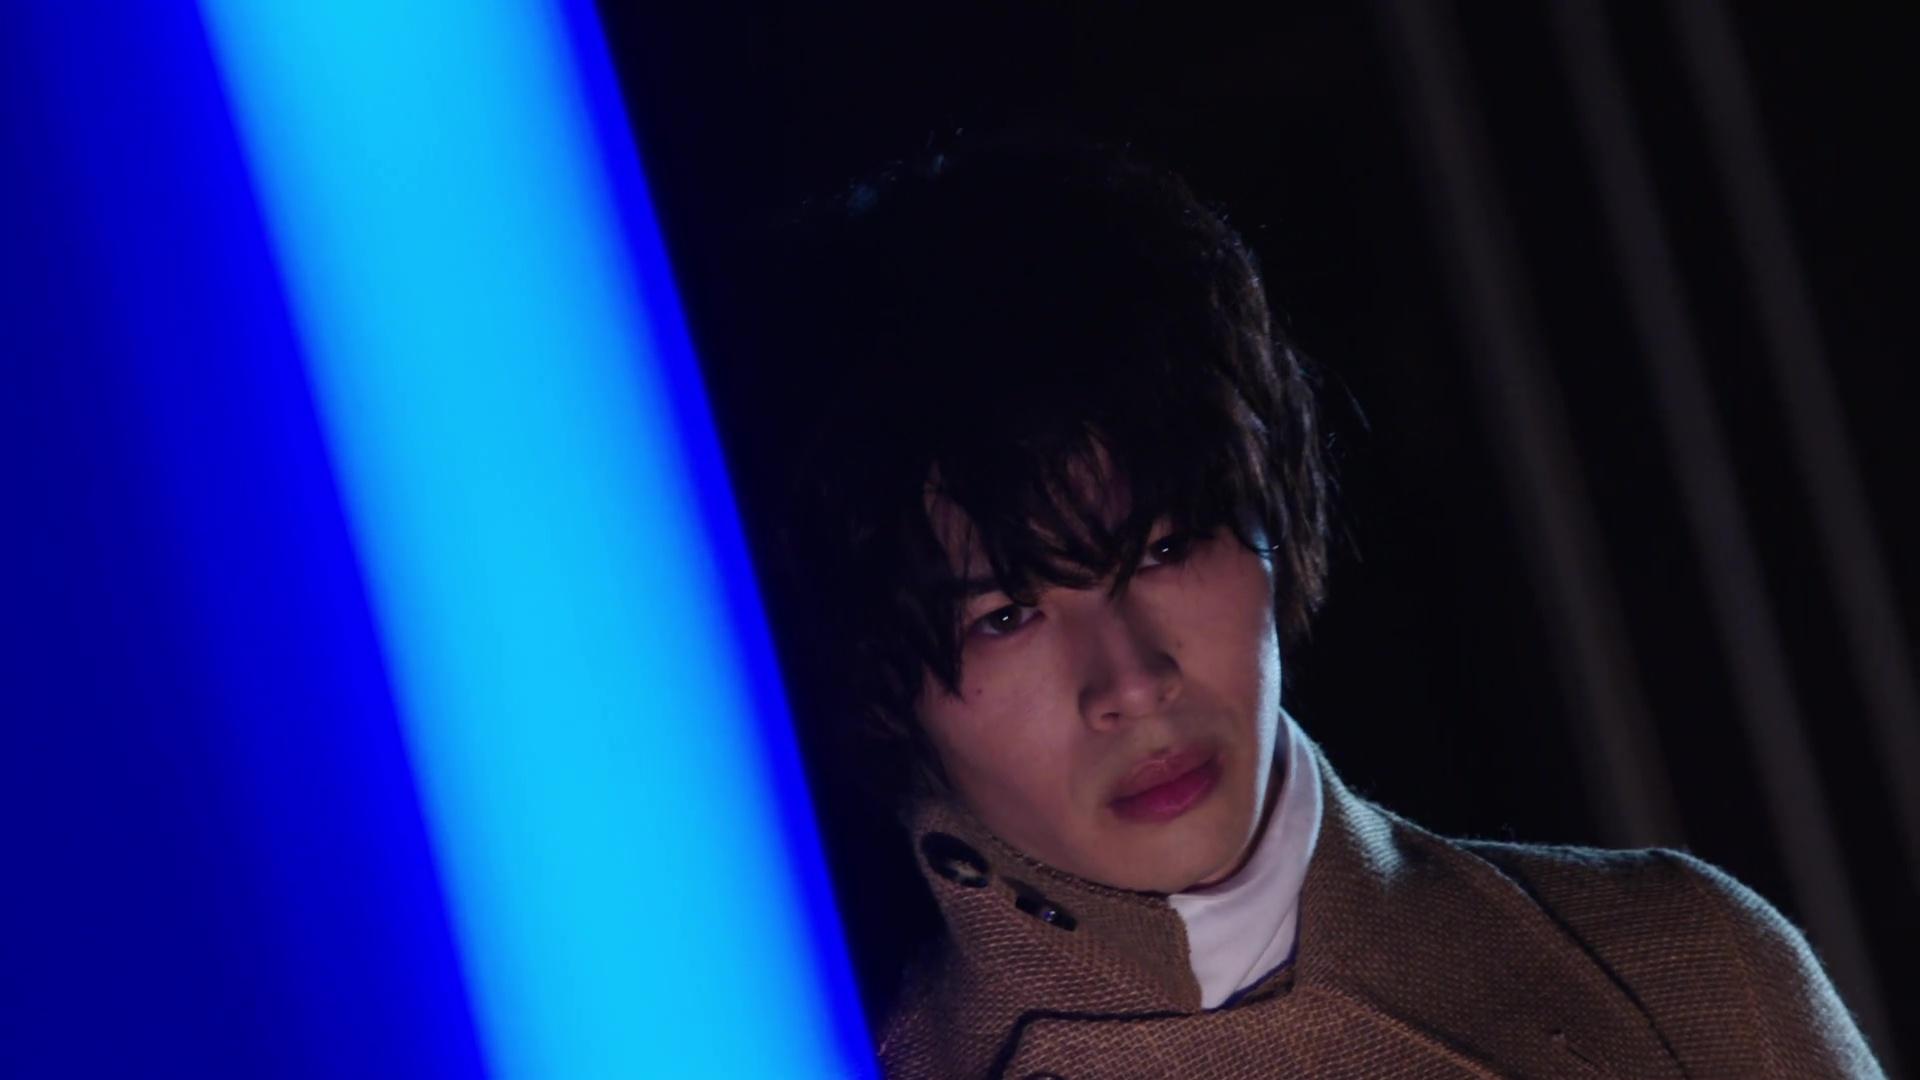 Kamen Rider Saber Episode 29 Recap